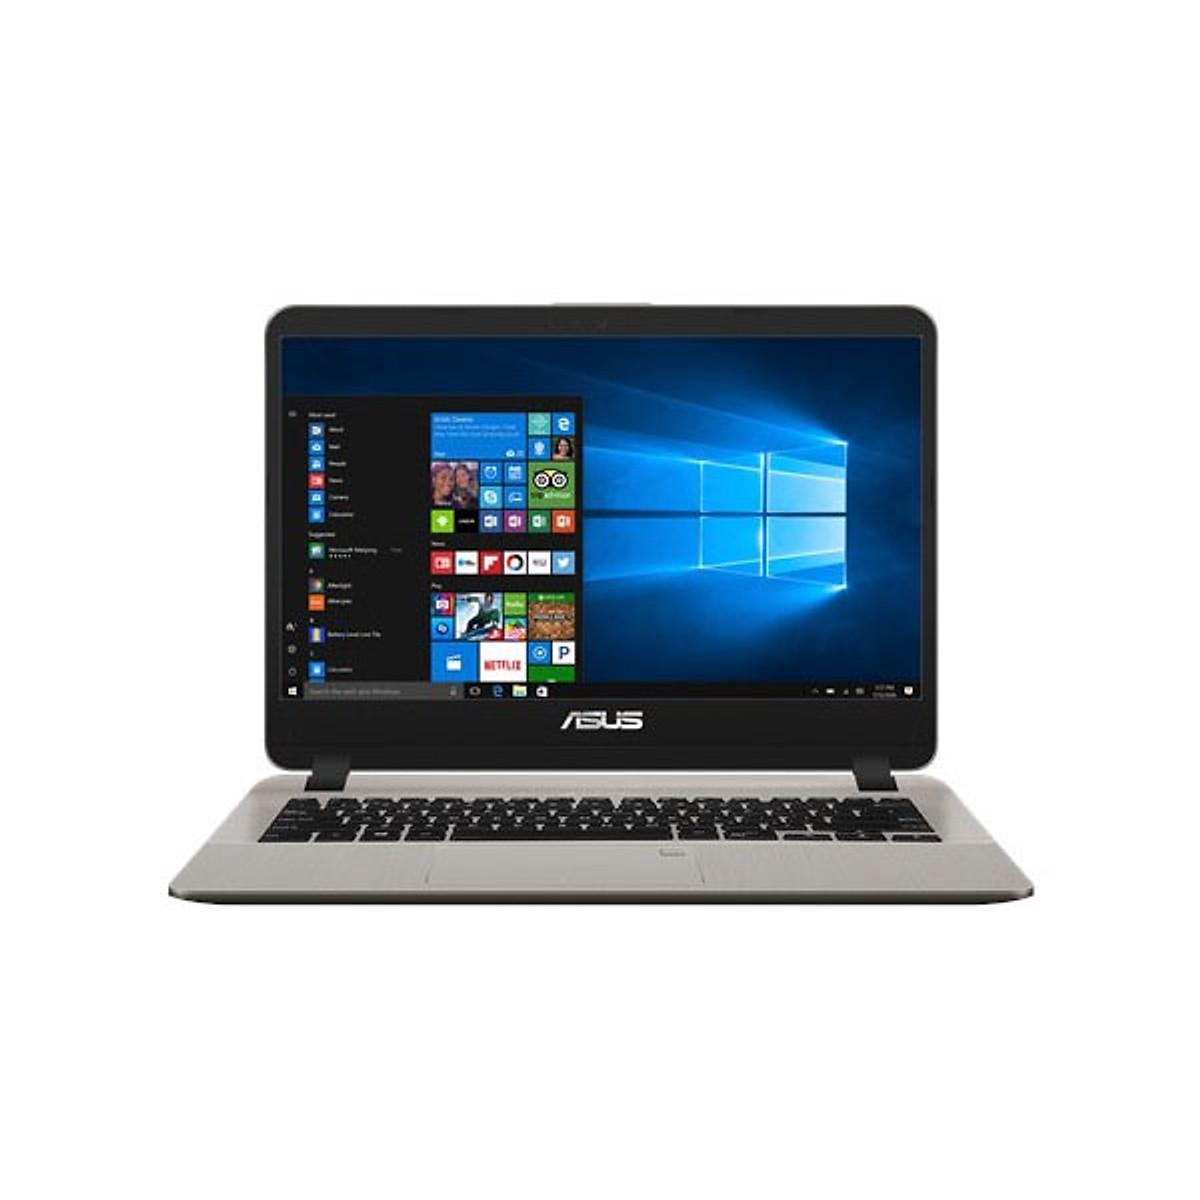 Asus   Máy tính xách tay - Laptop    Laptop ASUS VIVOBOOK X407UA - BV129T . intel Core I3 6006U (14i